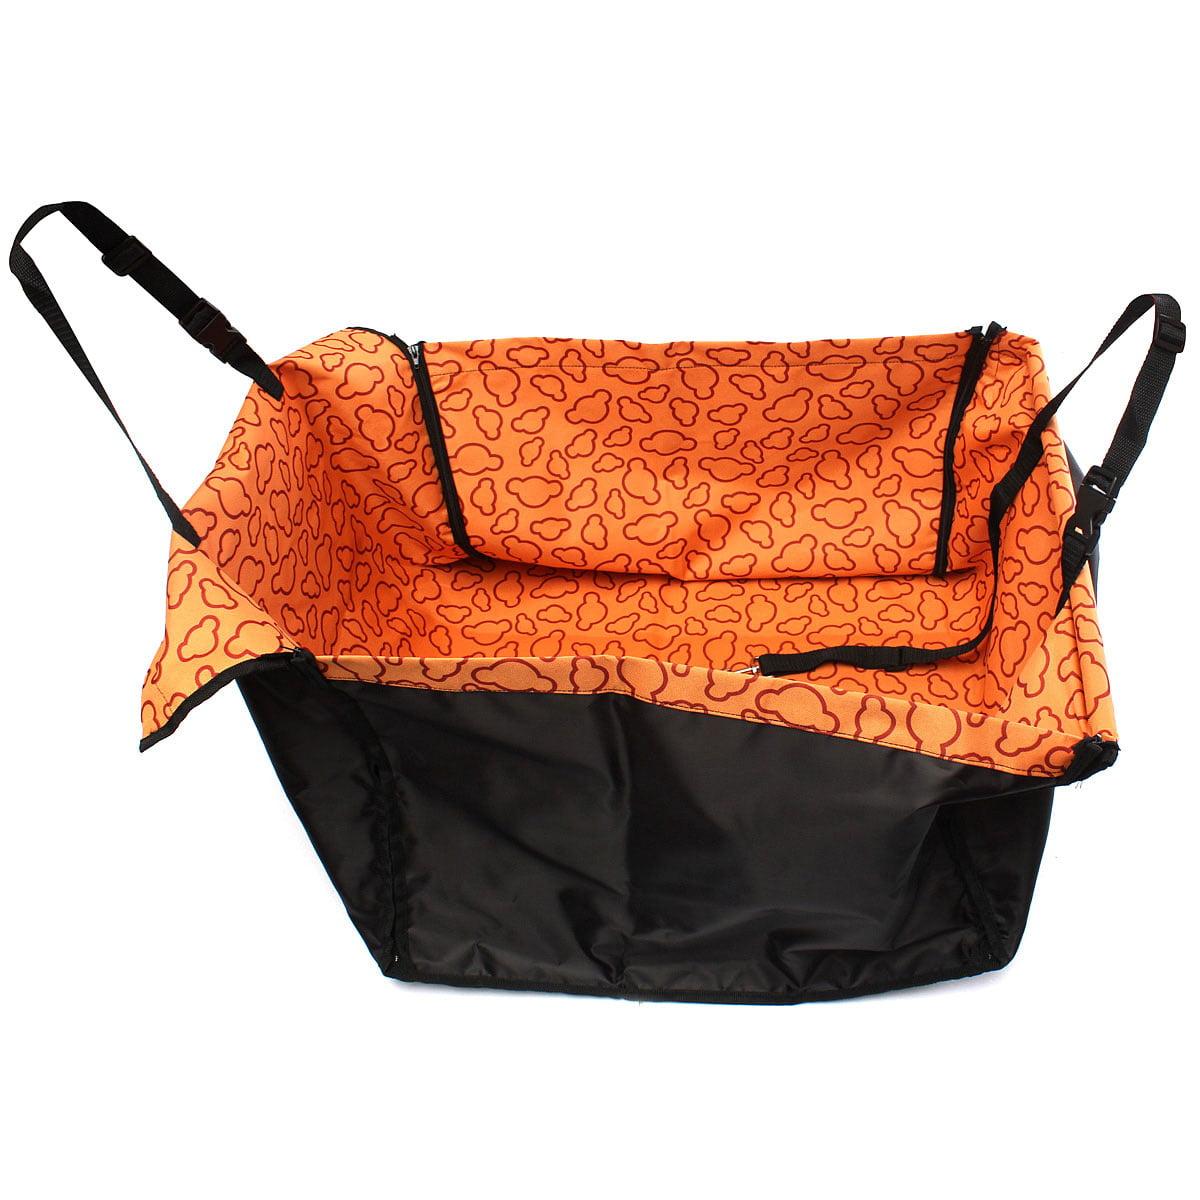 Pet Dog Cat Car Rear Back Seat Hammock Blanket Bed Safe Comfortable Waterproof Washable Crates Kennels